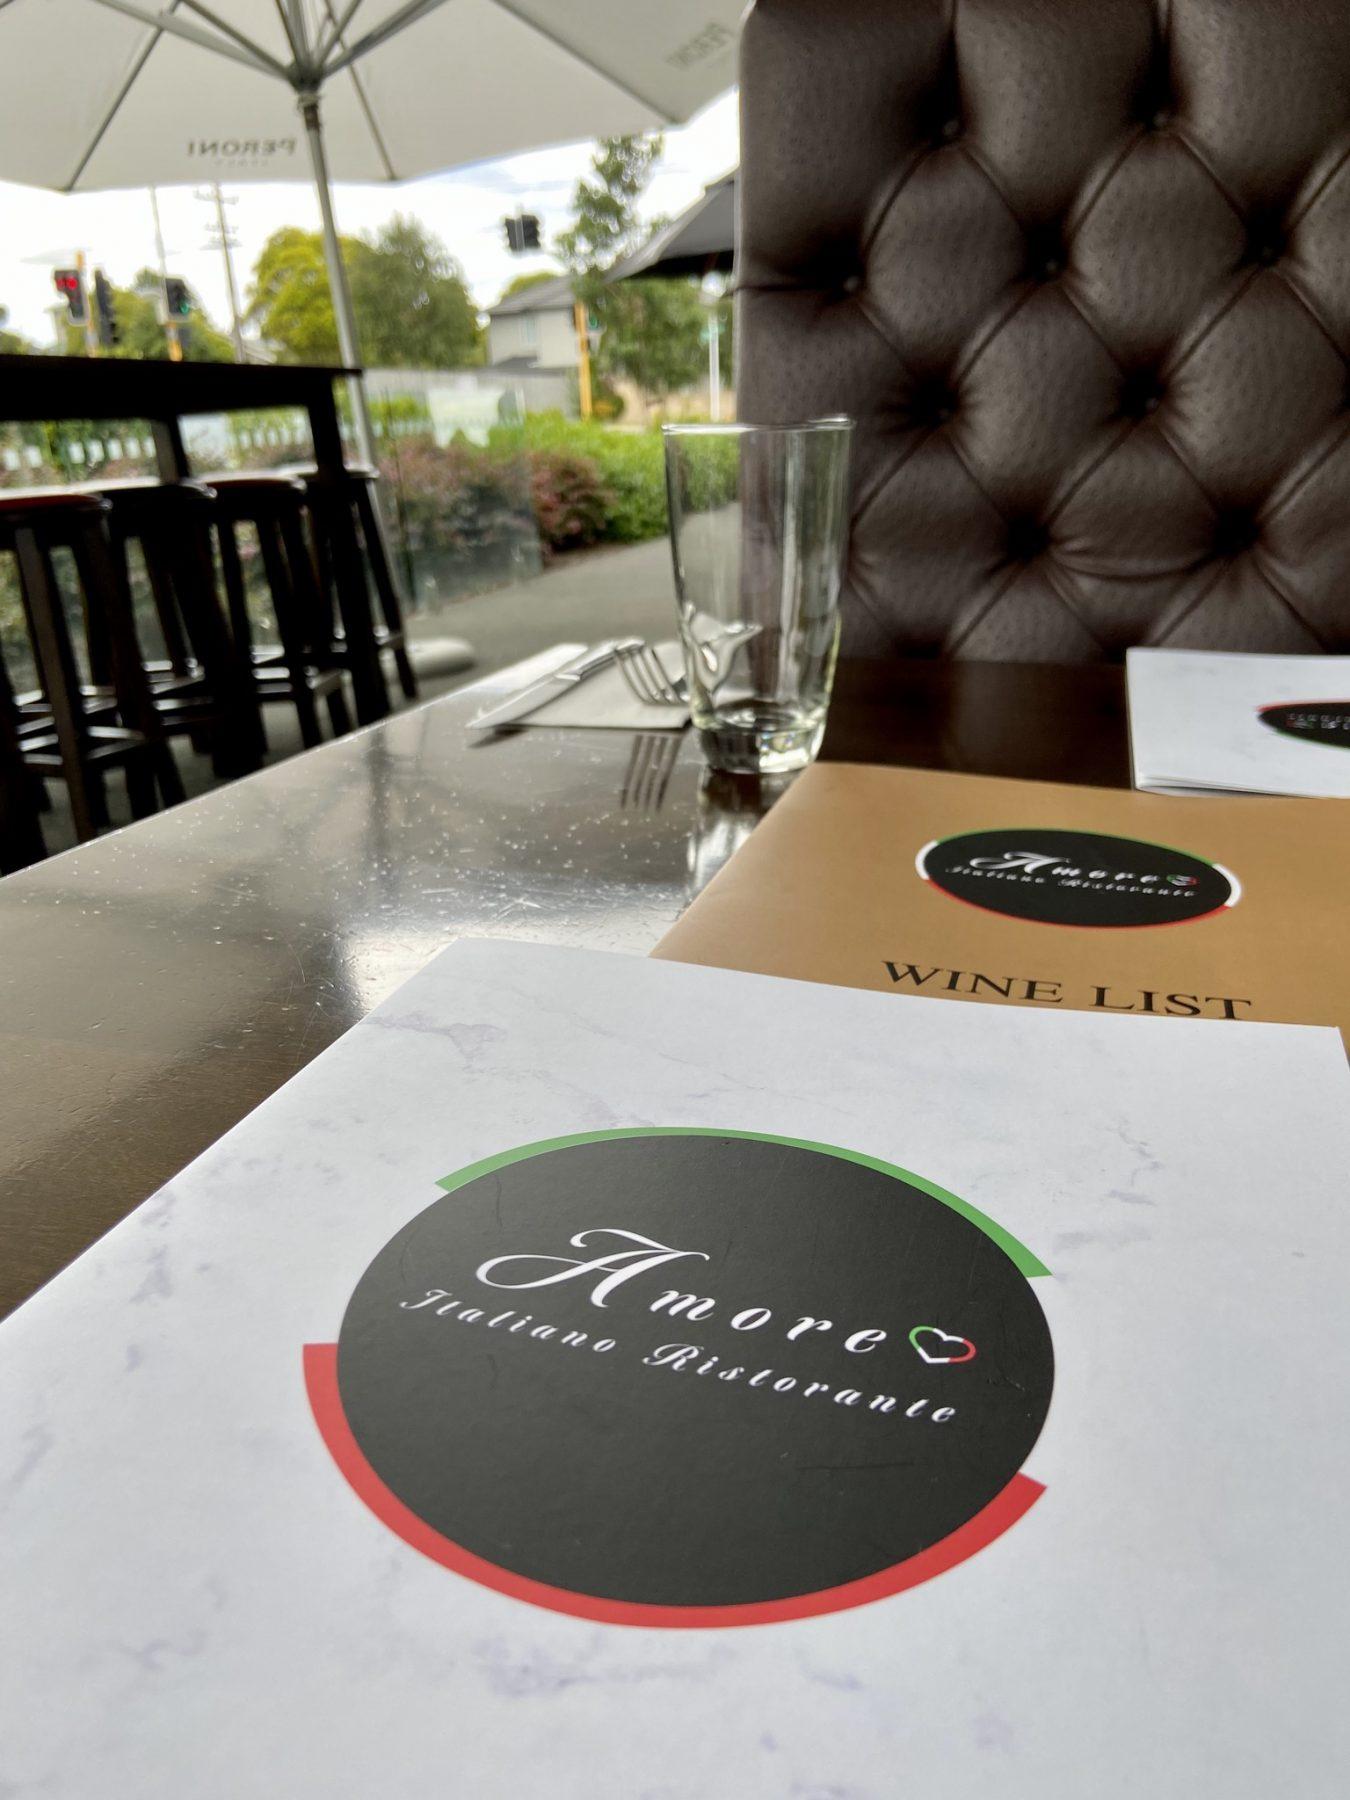 Amore Hobsonville Italian Restaurant Menu Cover